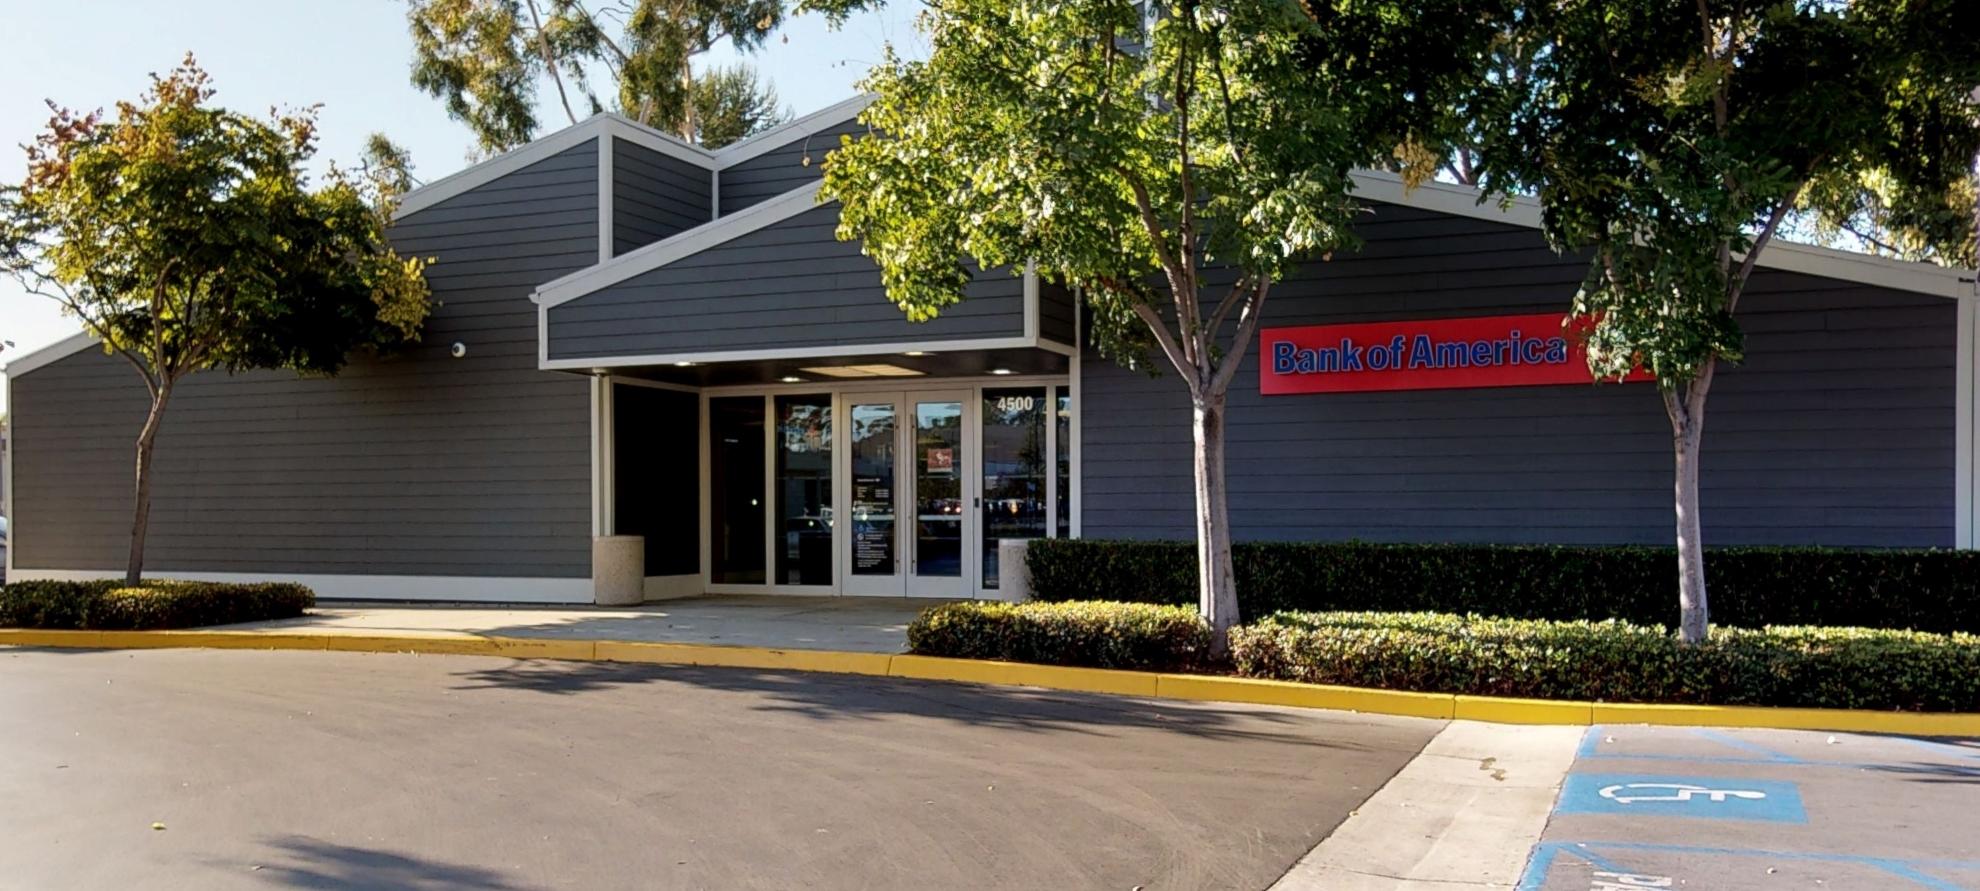 Bank of America financial center with walk-up ATM   4500 Barranca Pkwy, Irvine, CA 92604